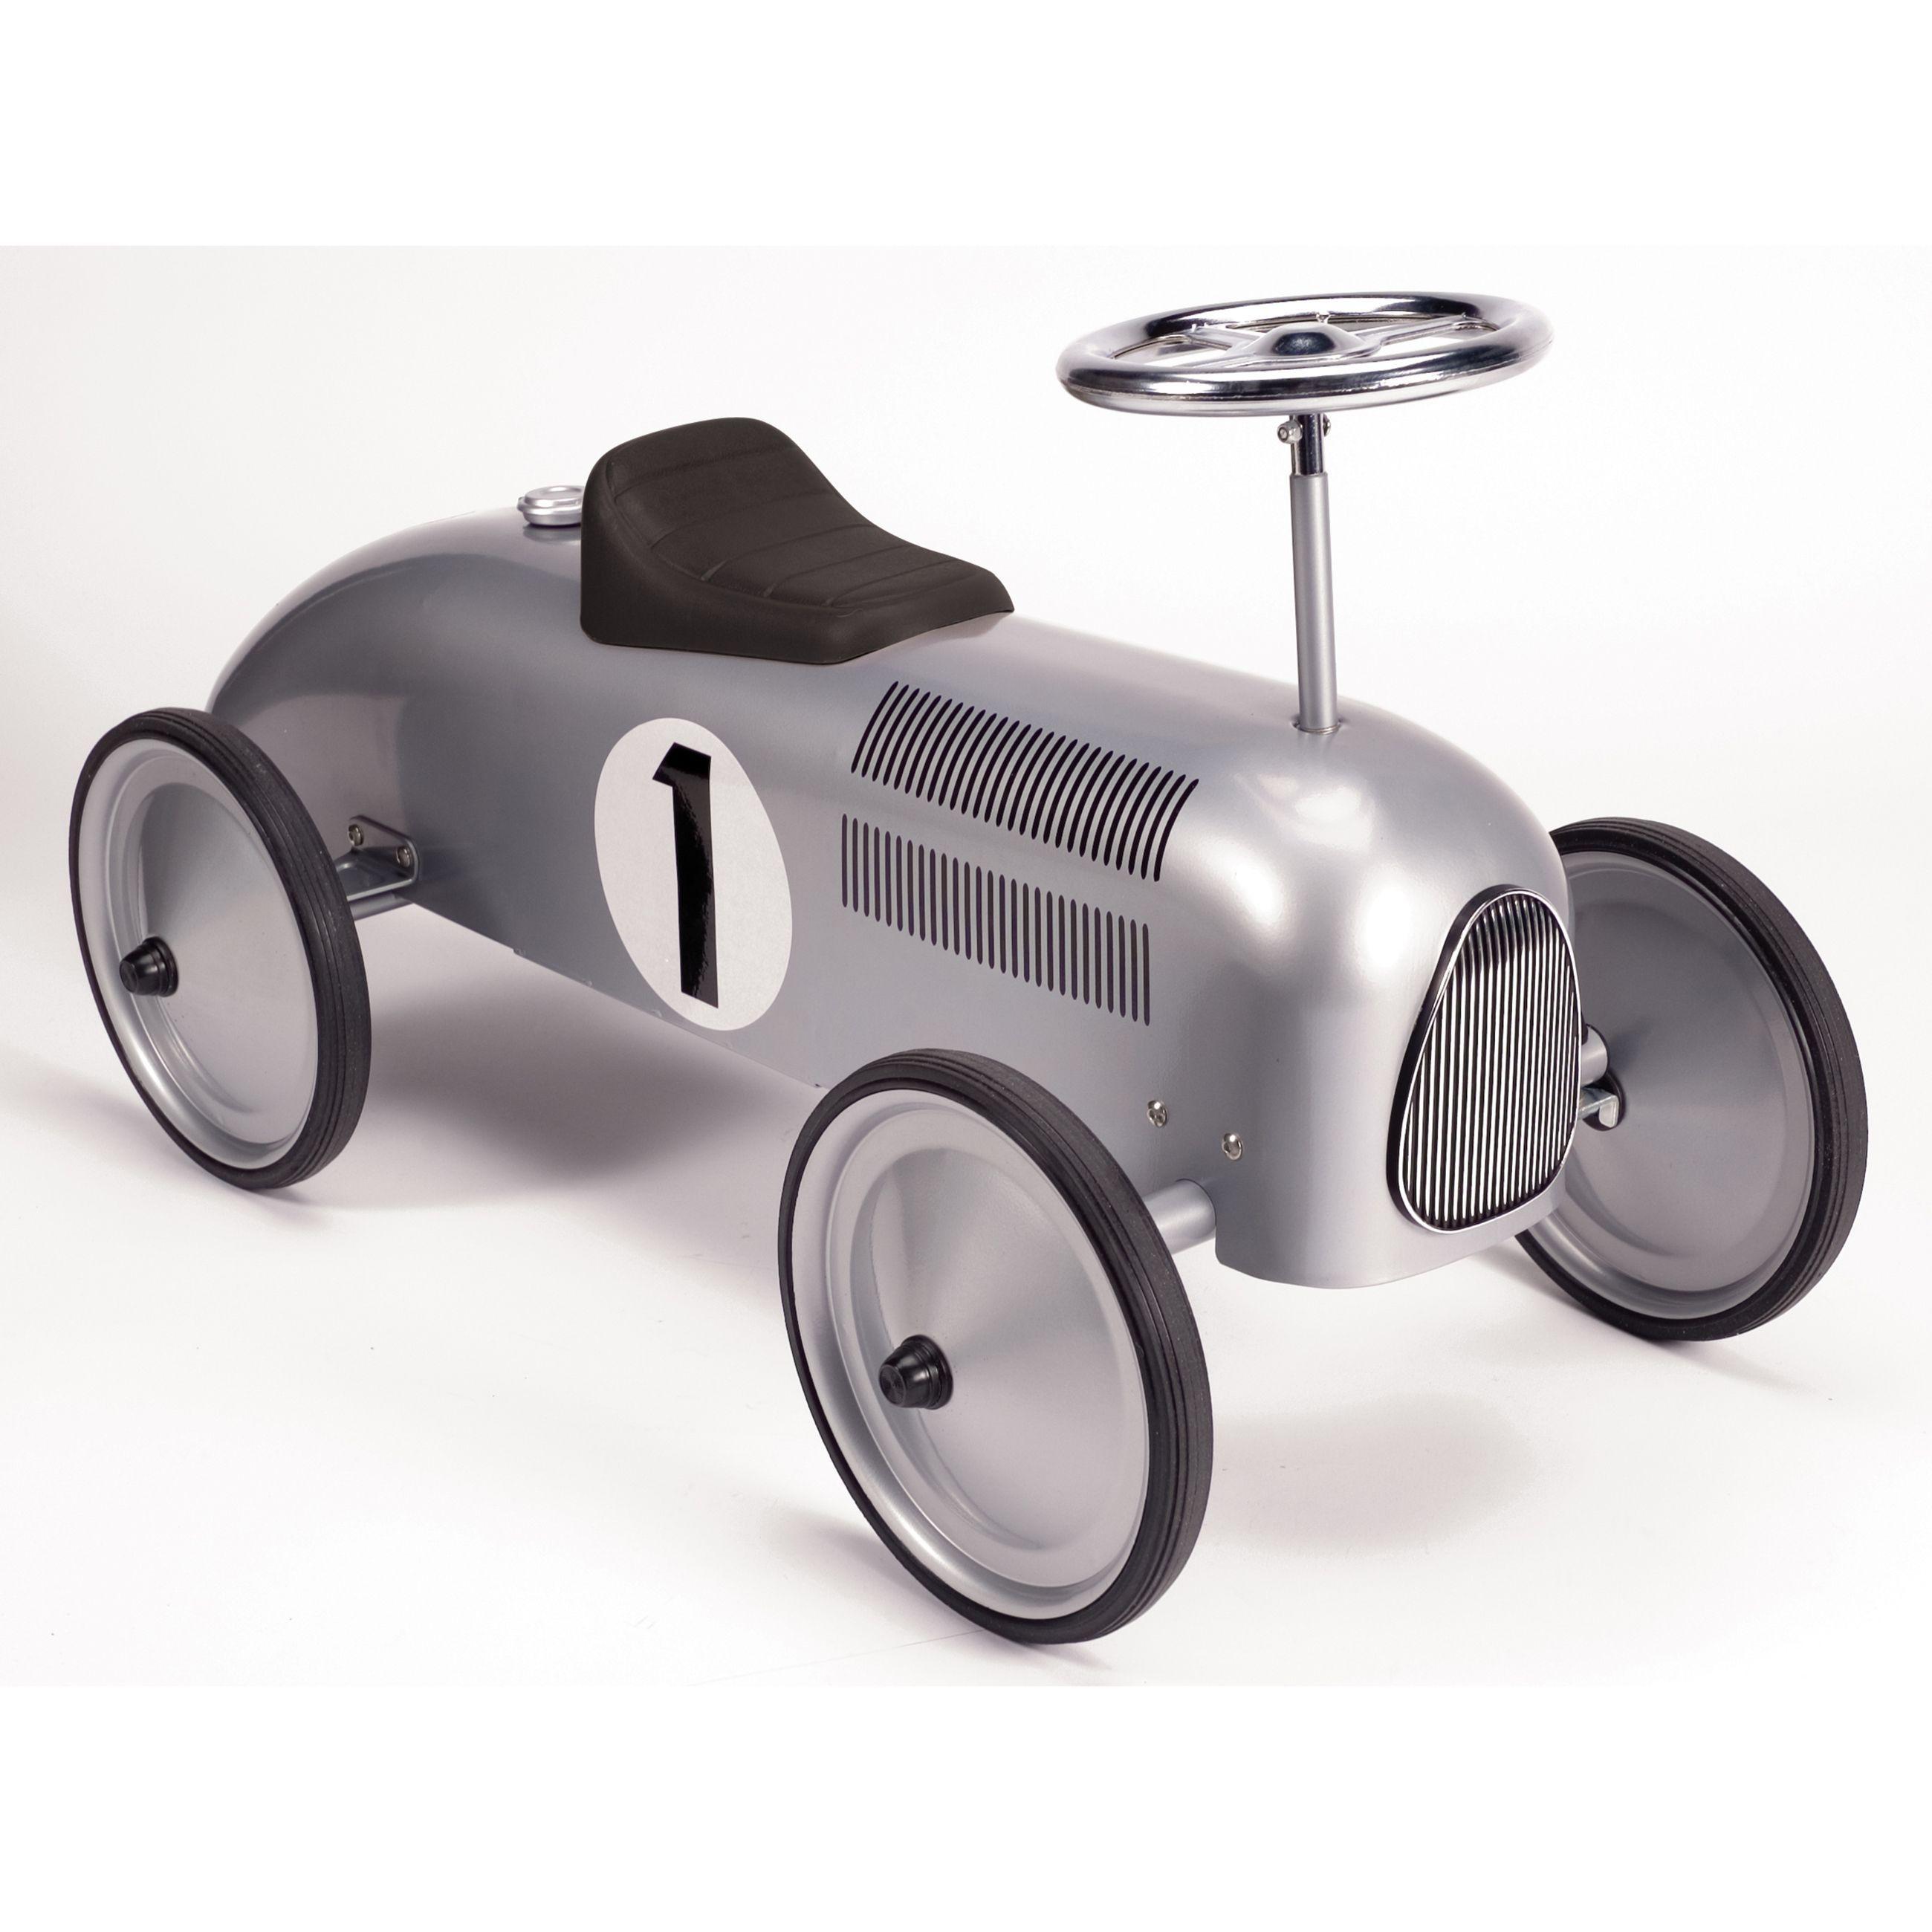 Schylling Speedster Silver Metal Retro Race Ride On G019649220816 Multicolor Car Nursery Ride On Toys Kids Furniture